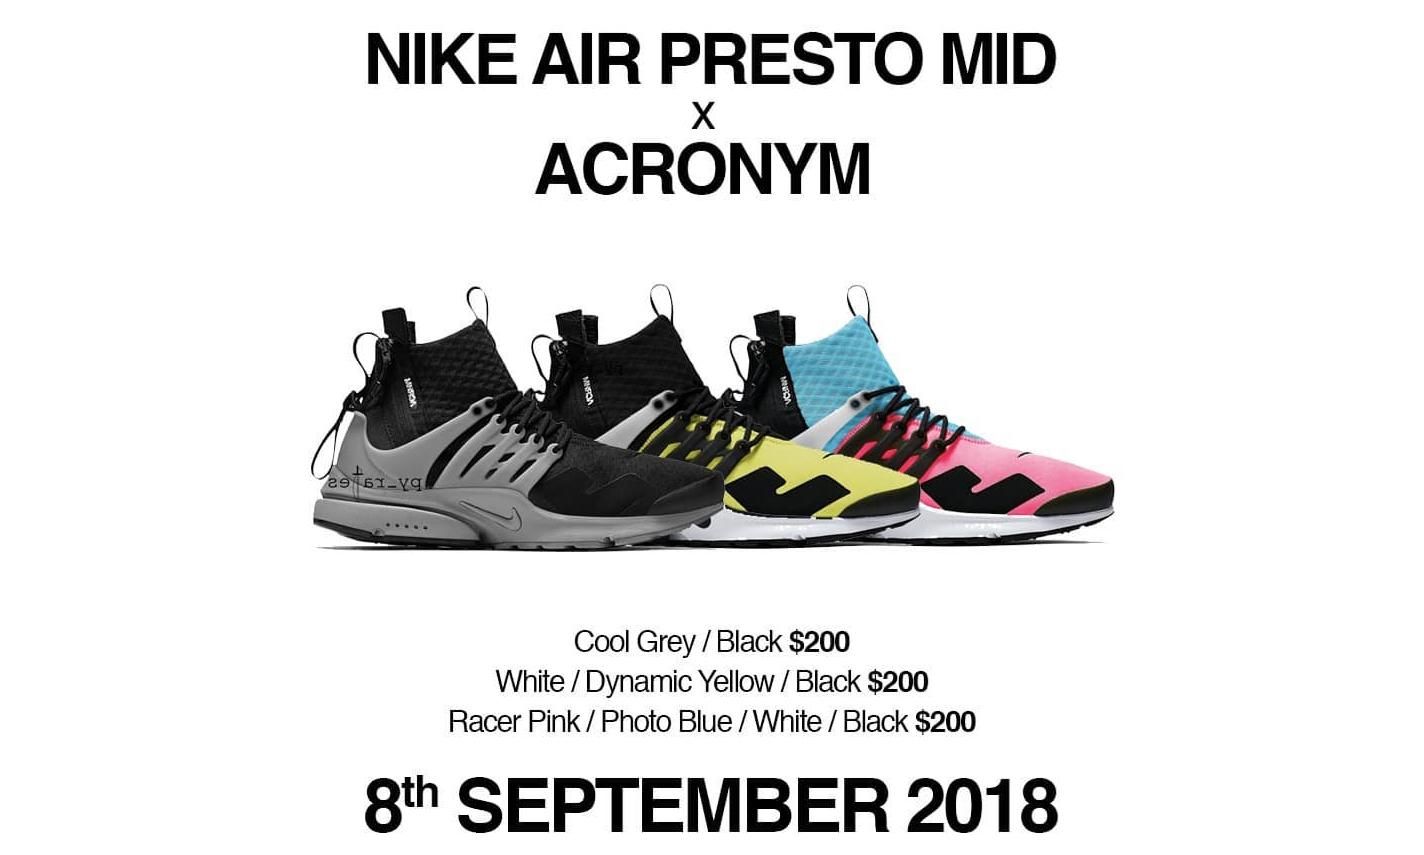 ACRONYM® x NikeLab Air Presto Mid 新配色系列发售日期公布